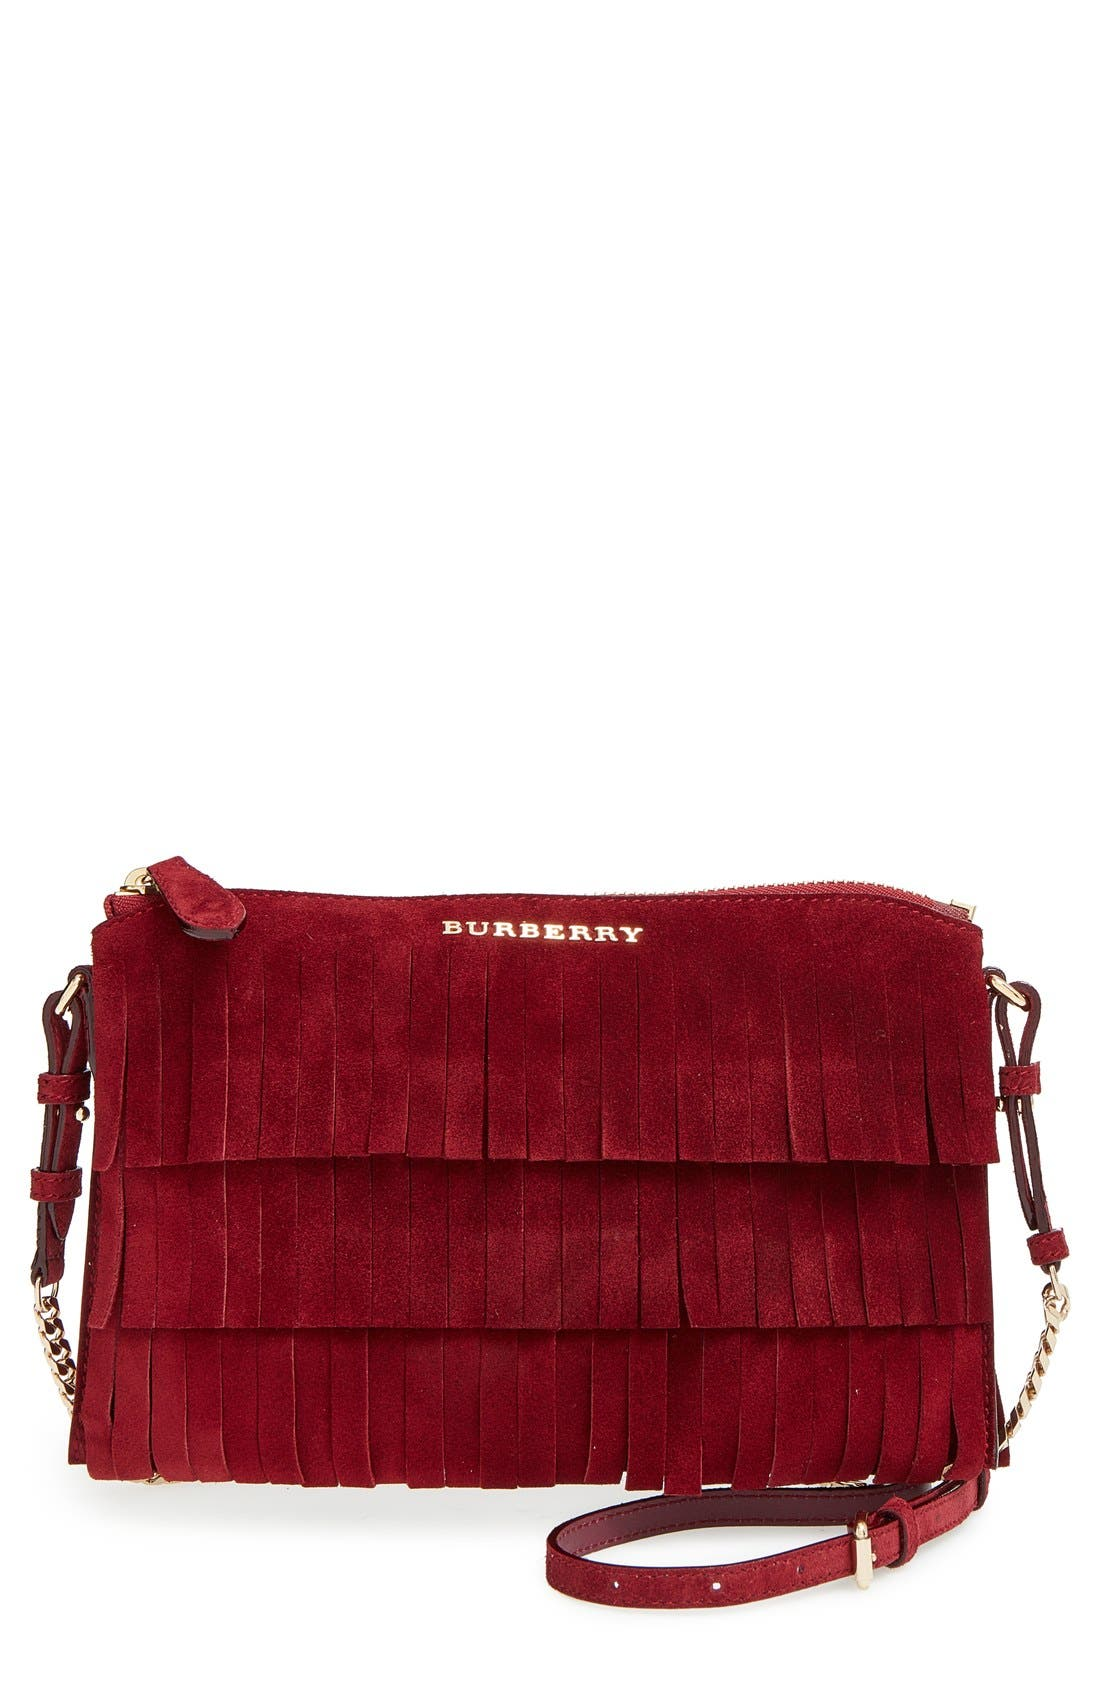 'Peyton' Fringe Suede Crossbody Bag,                         Main,                         color, Cherry